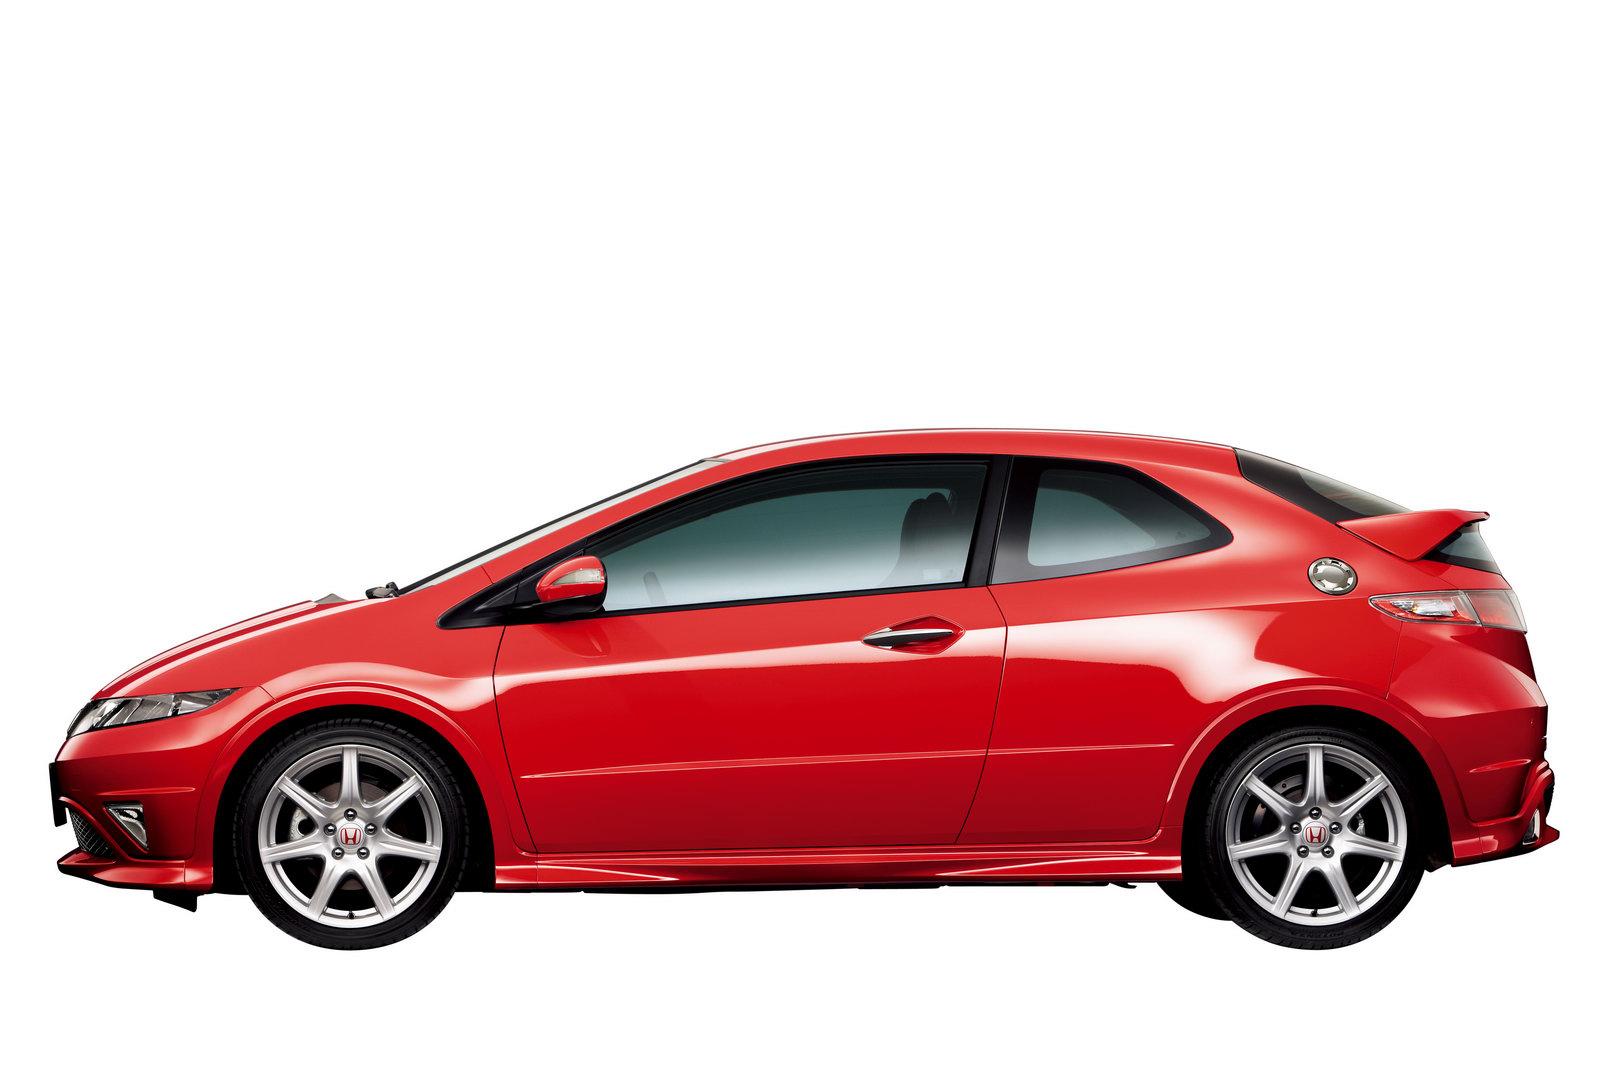 2011 Honda Civic Type R Euro Limited Edition